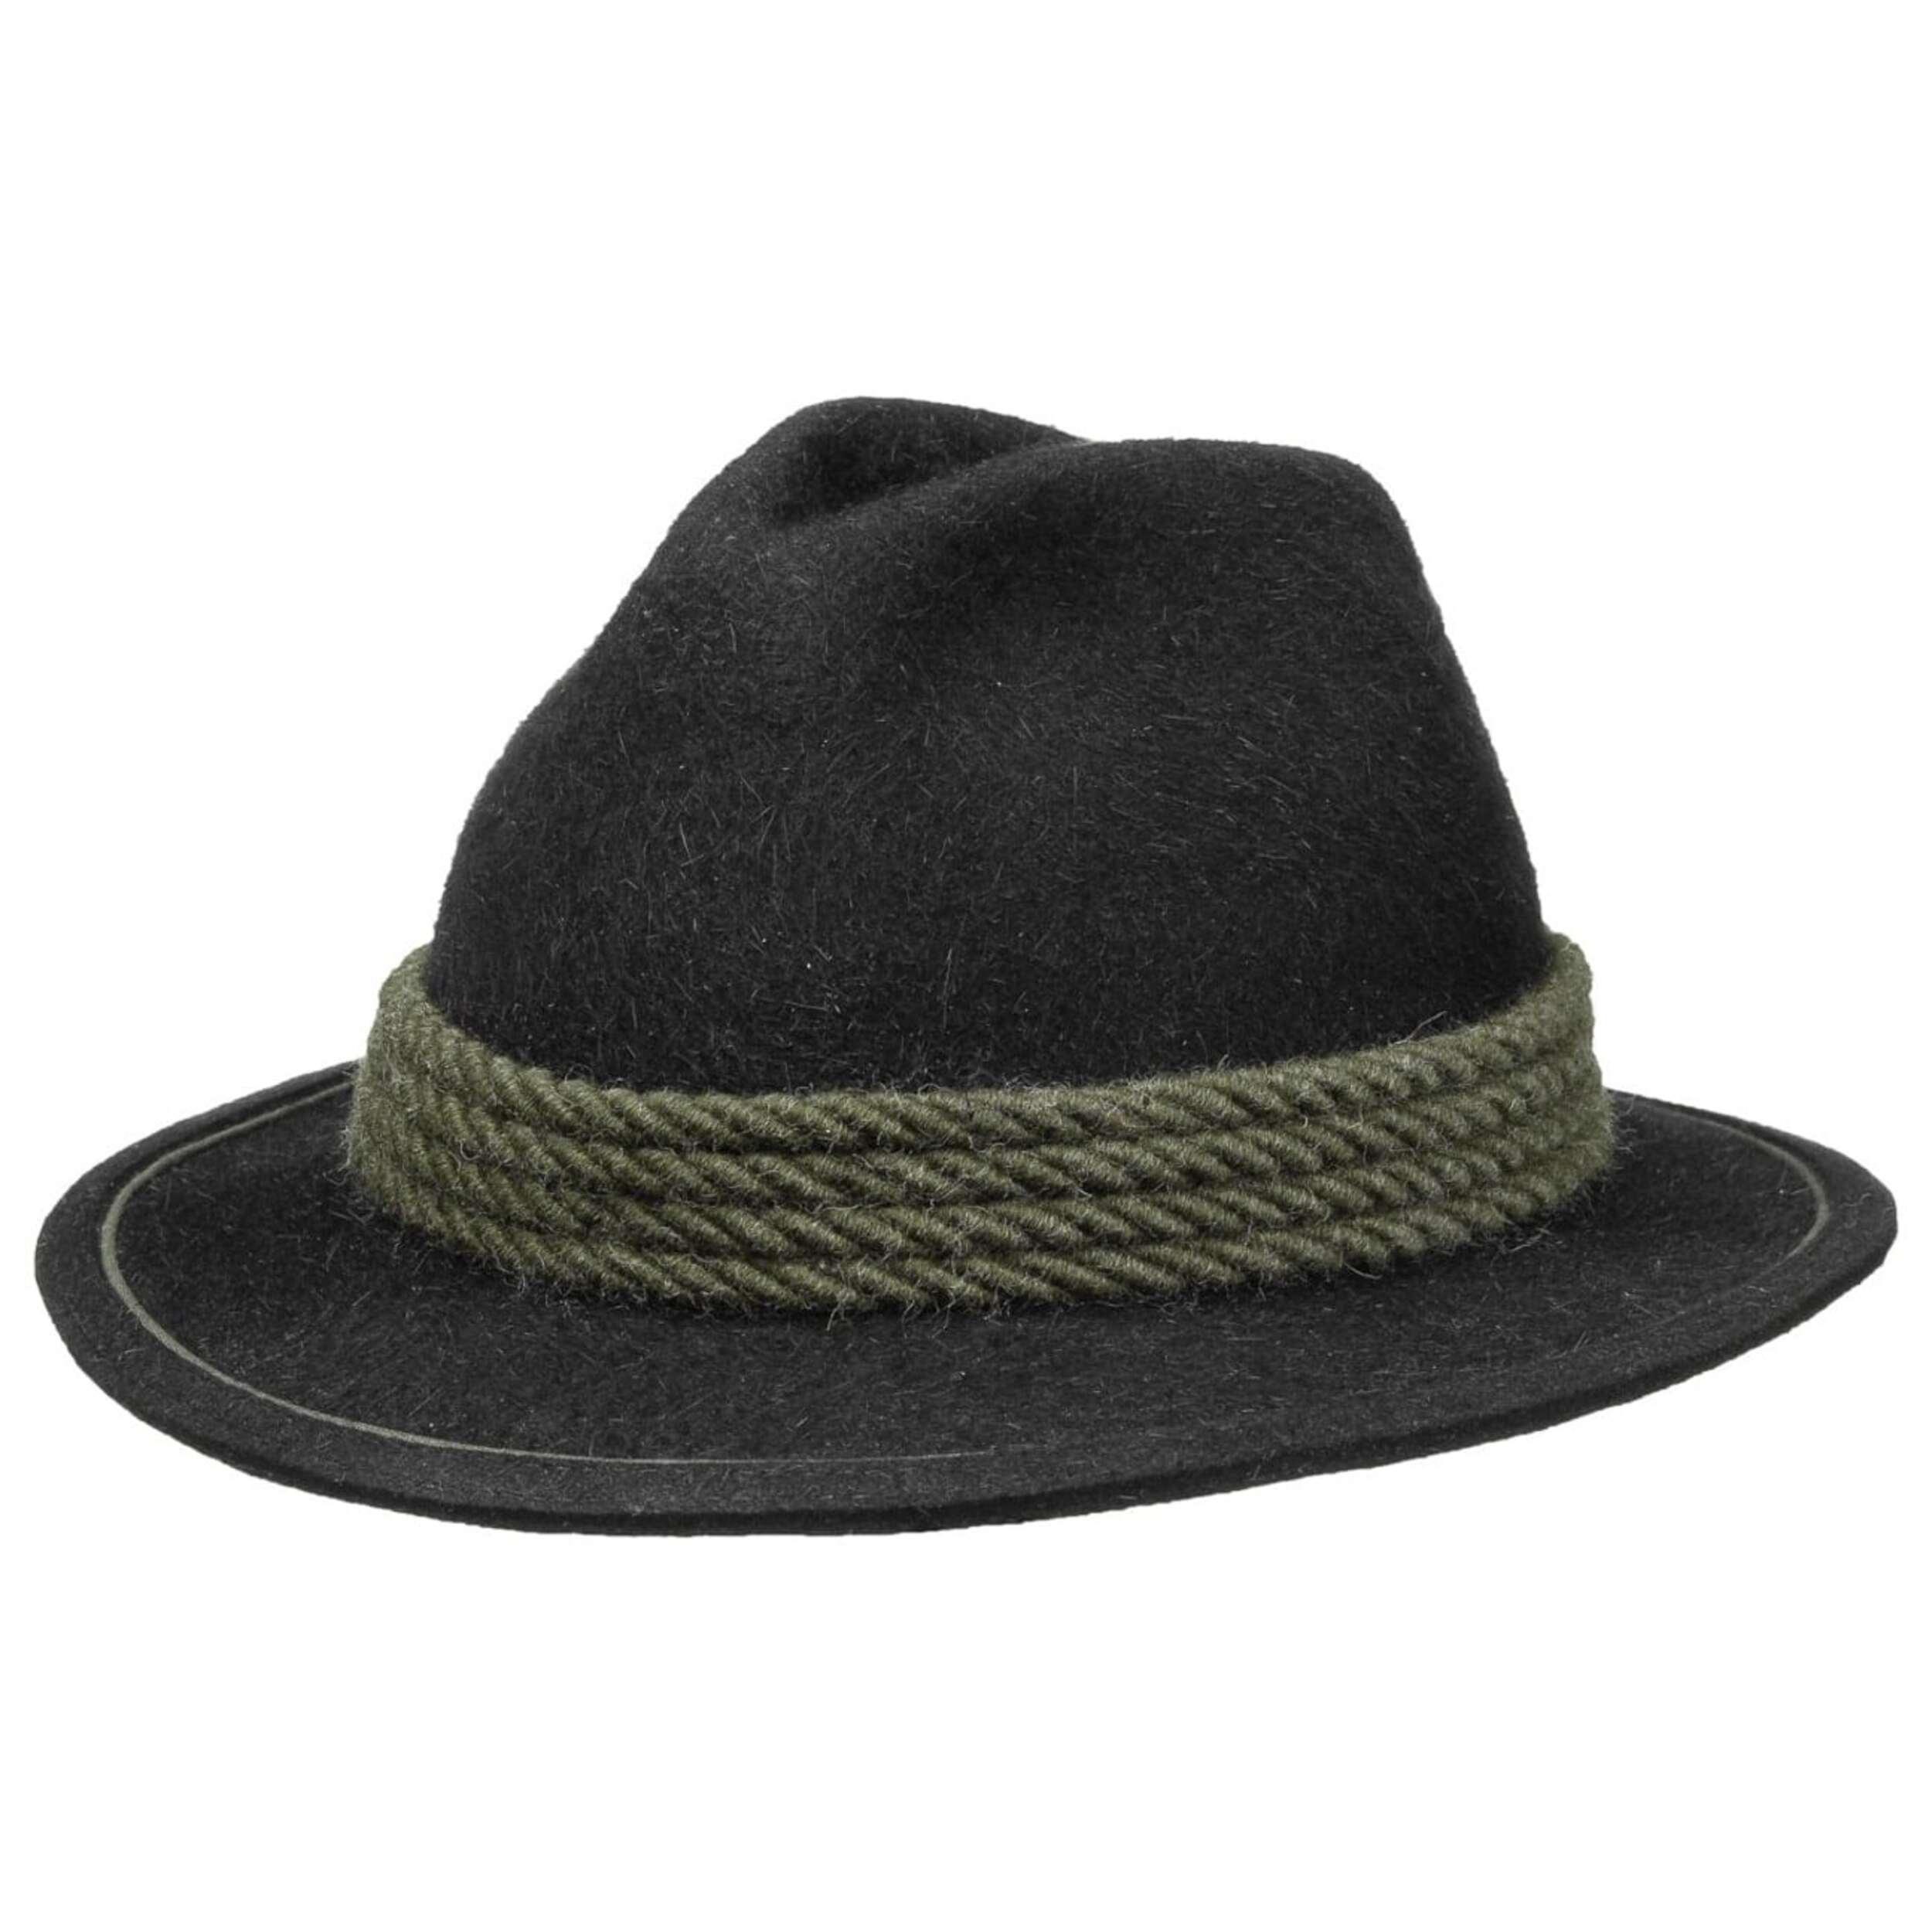 Hat shop online uk